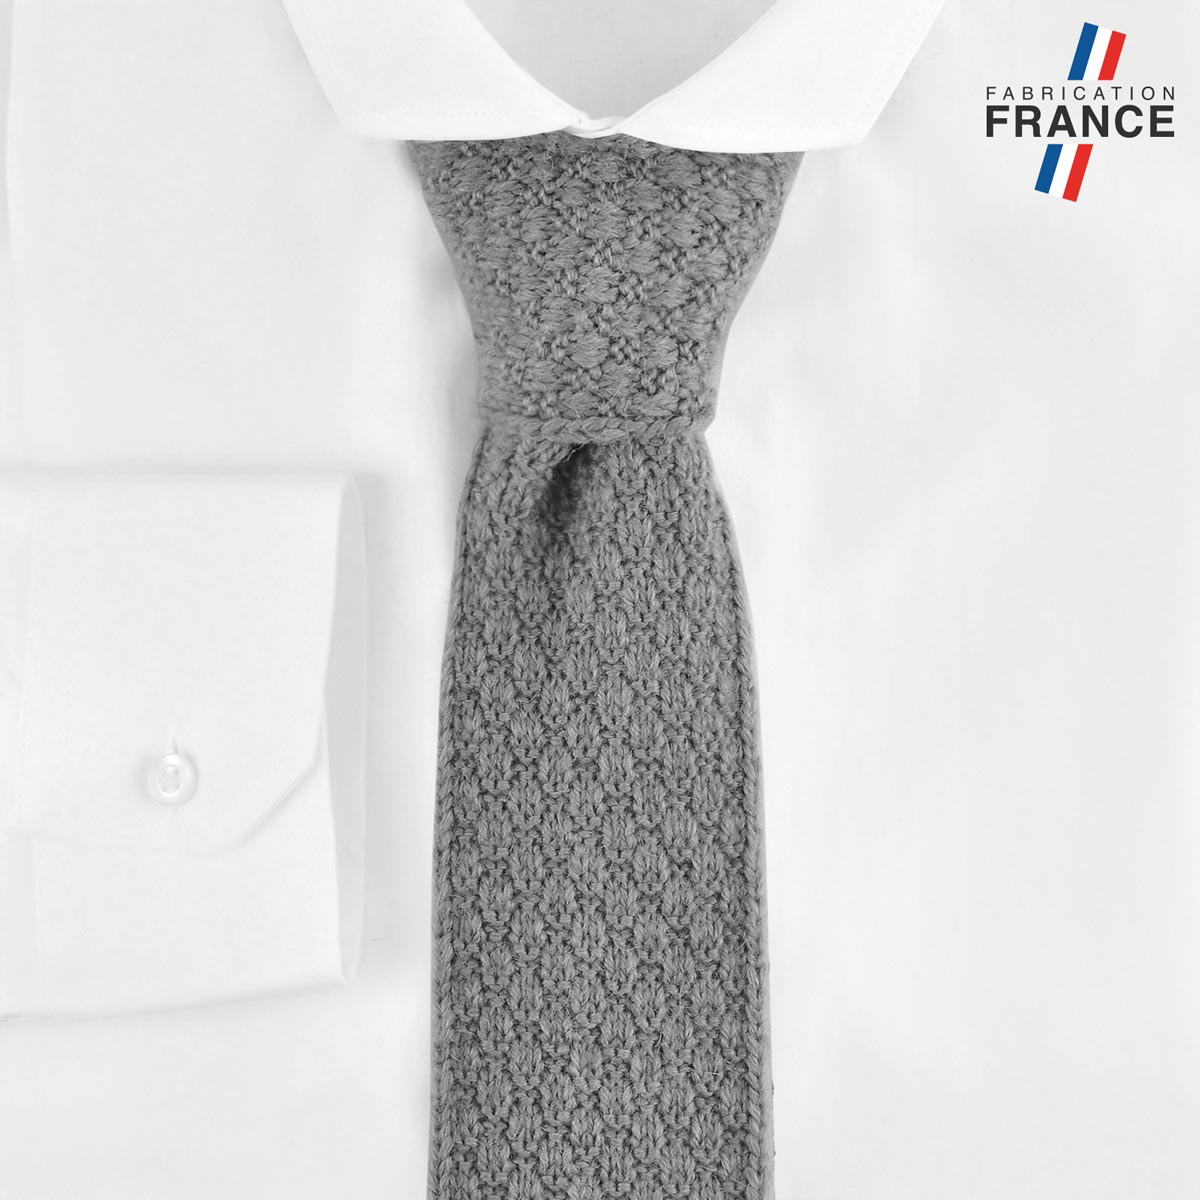 CV-00463_F12-2FR_Cravate-tricot-grise-fabrication-francaise